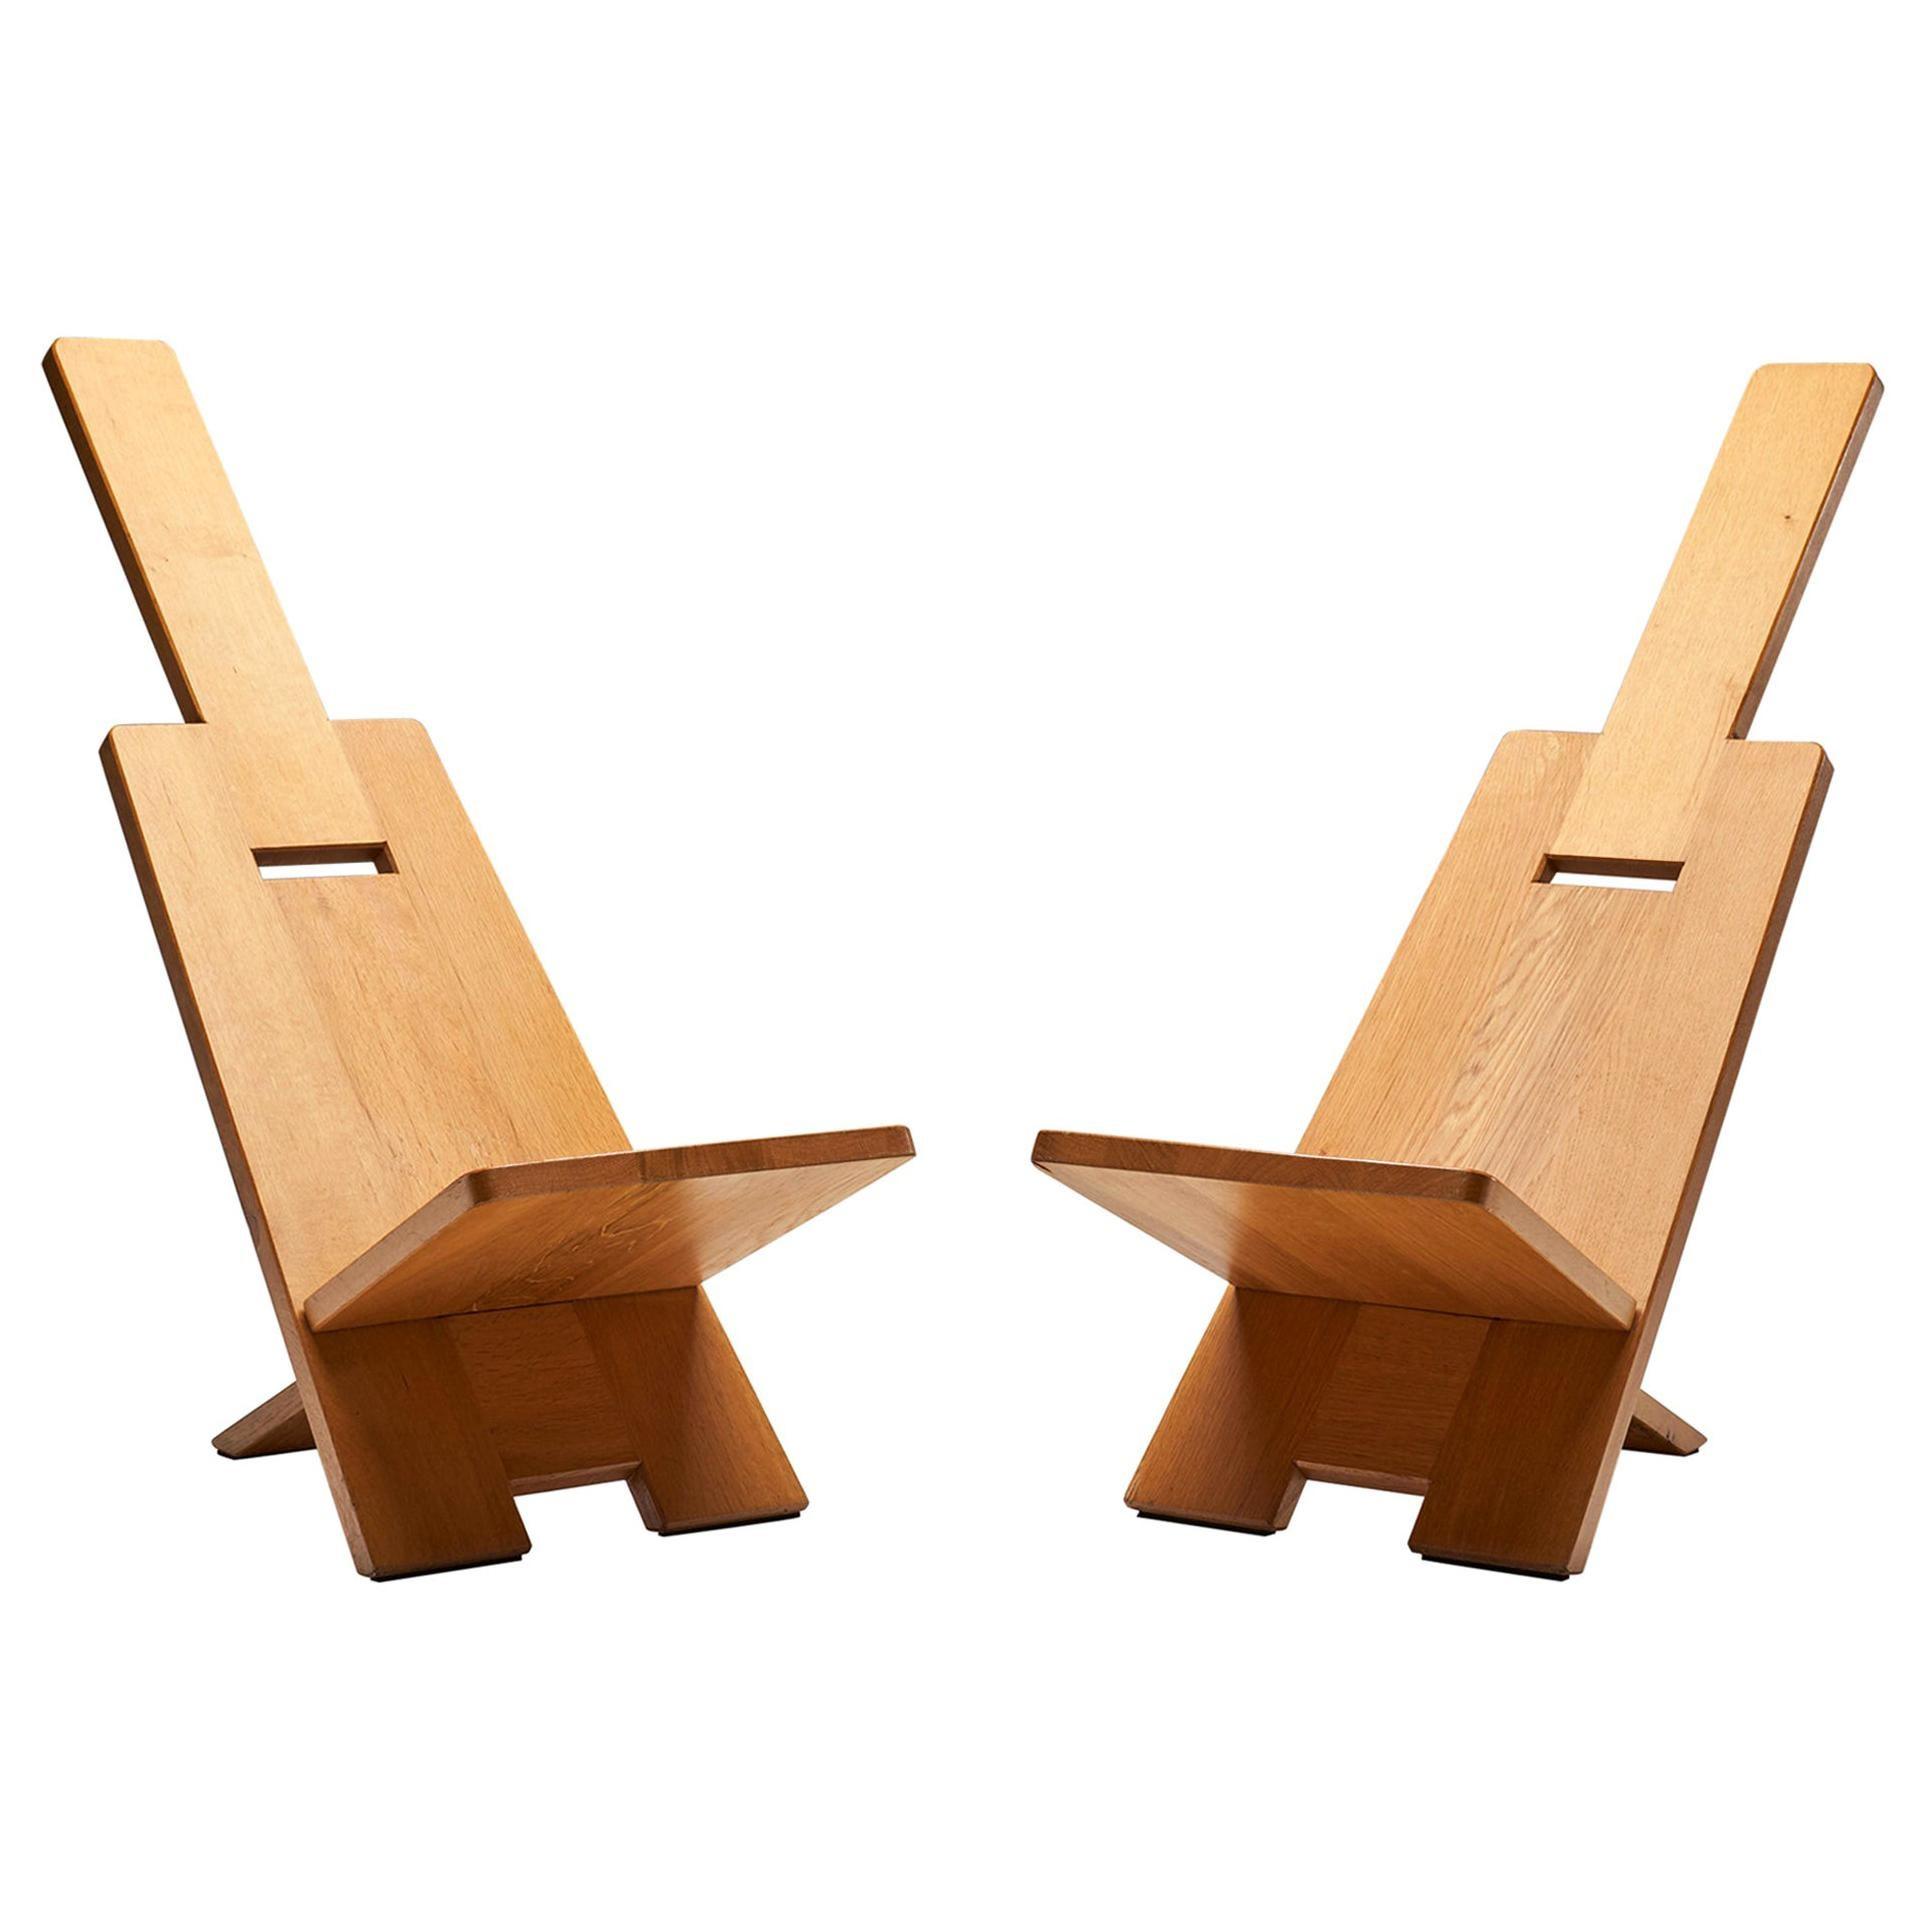 "Pair of Alain Gaubert ""Africanist"" Chairs, France, 1980s"